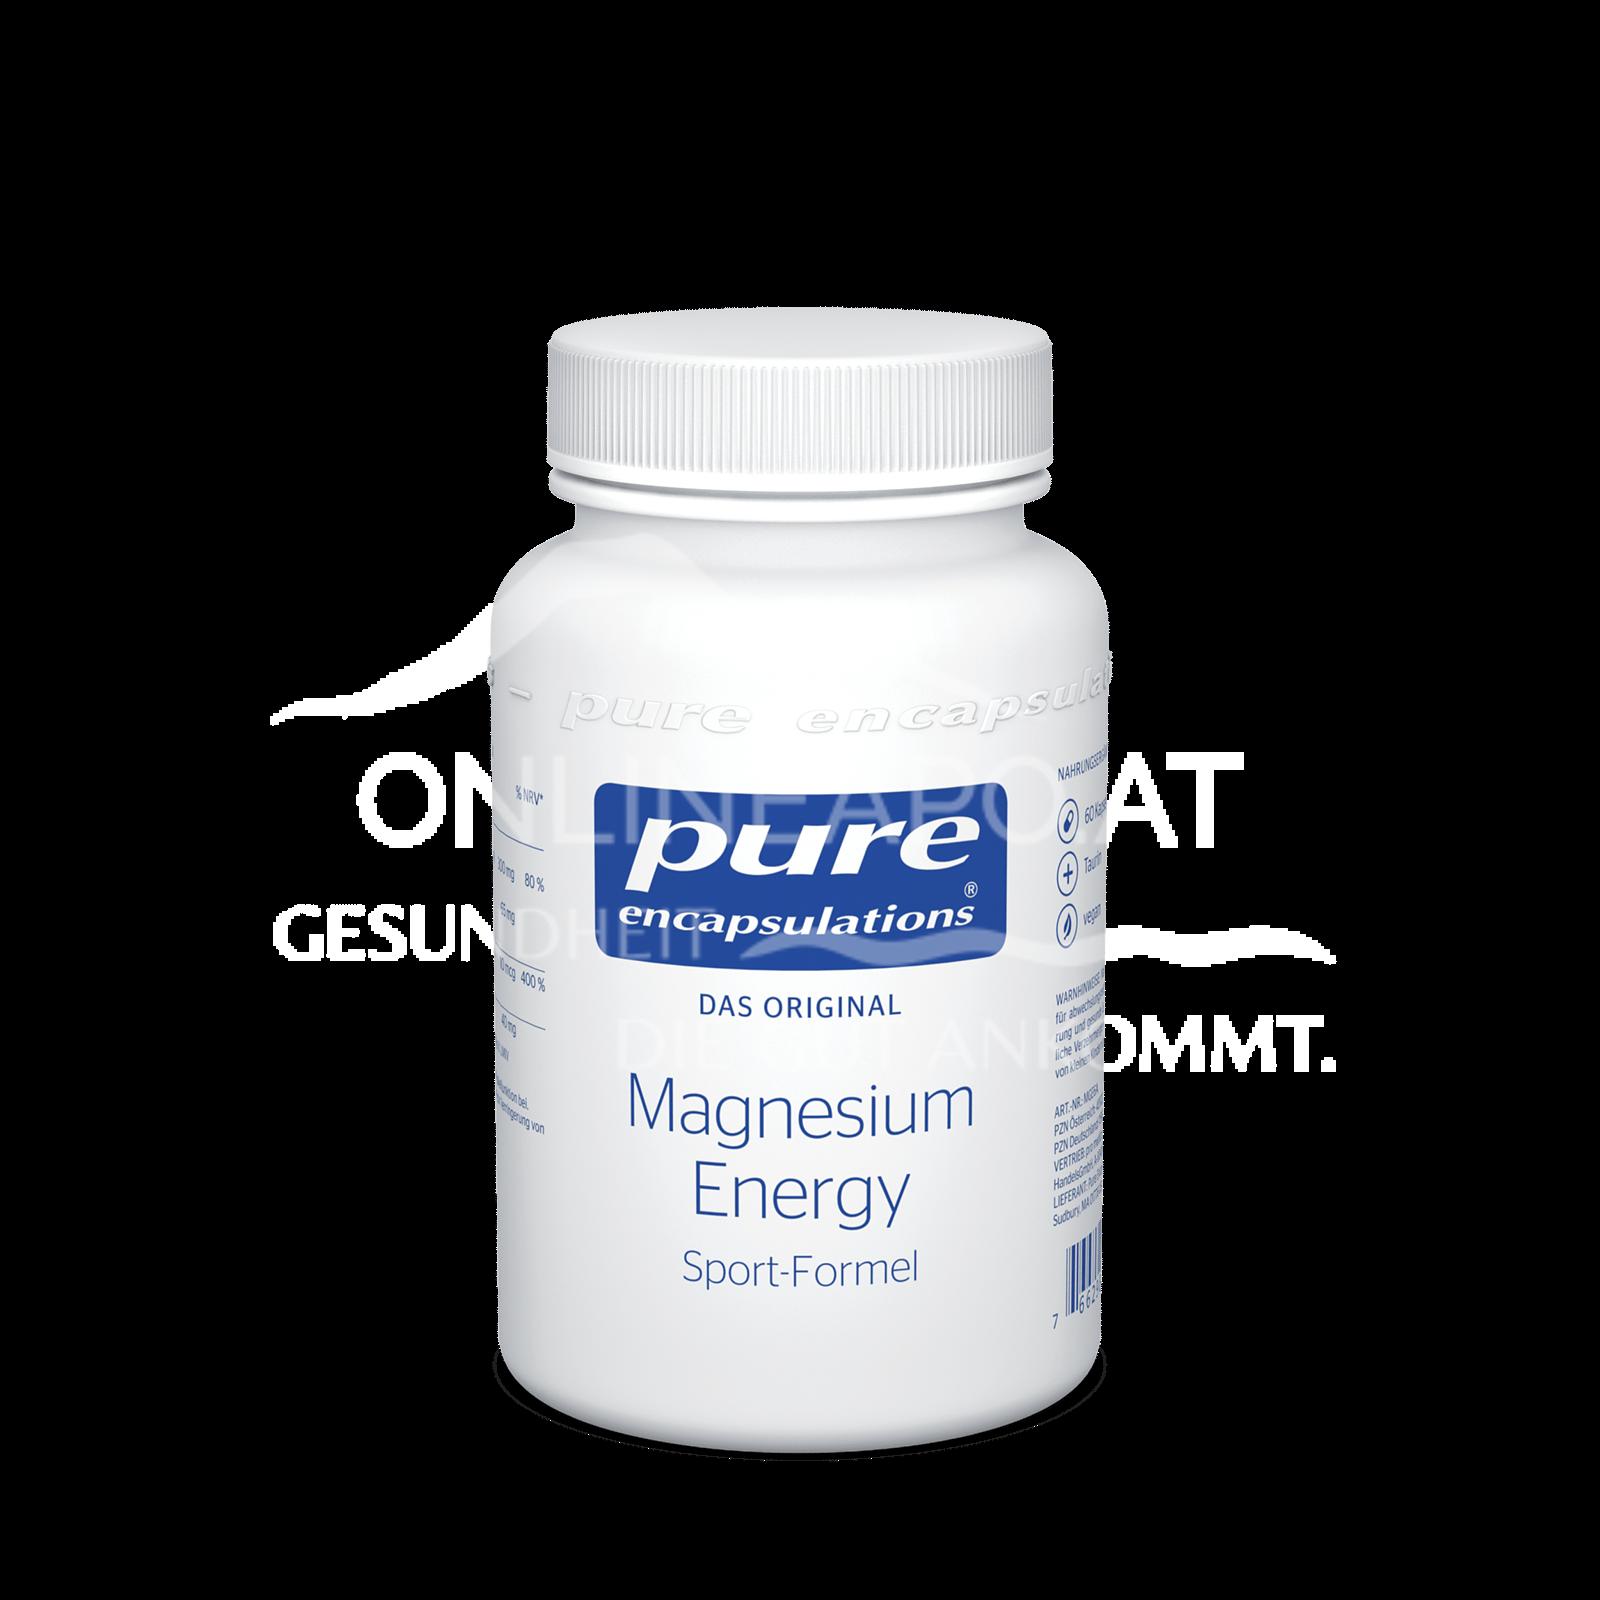 pure encapsulations® Magnesium Energy